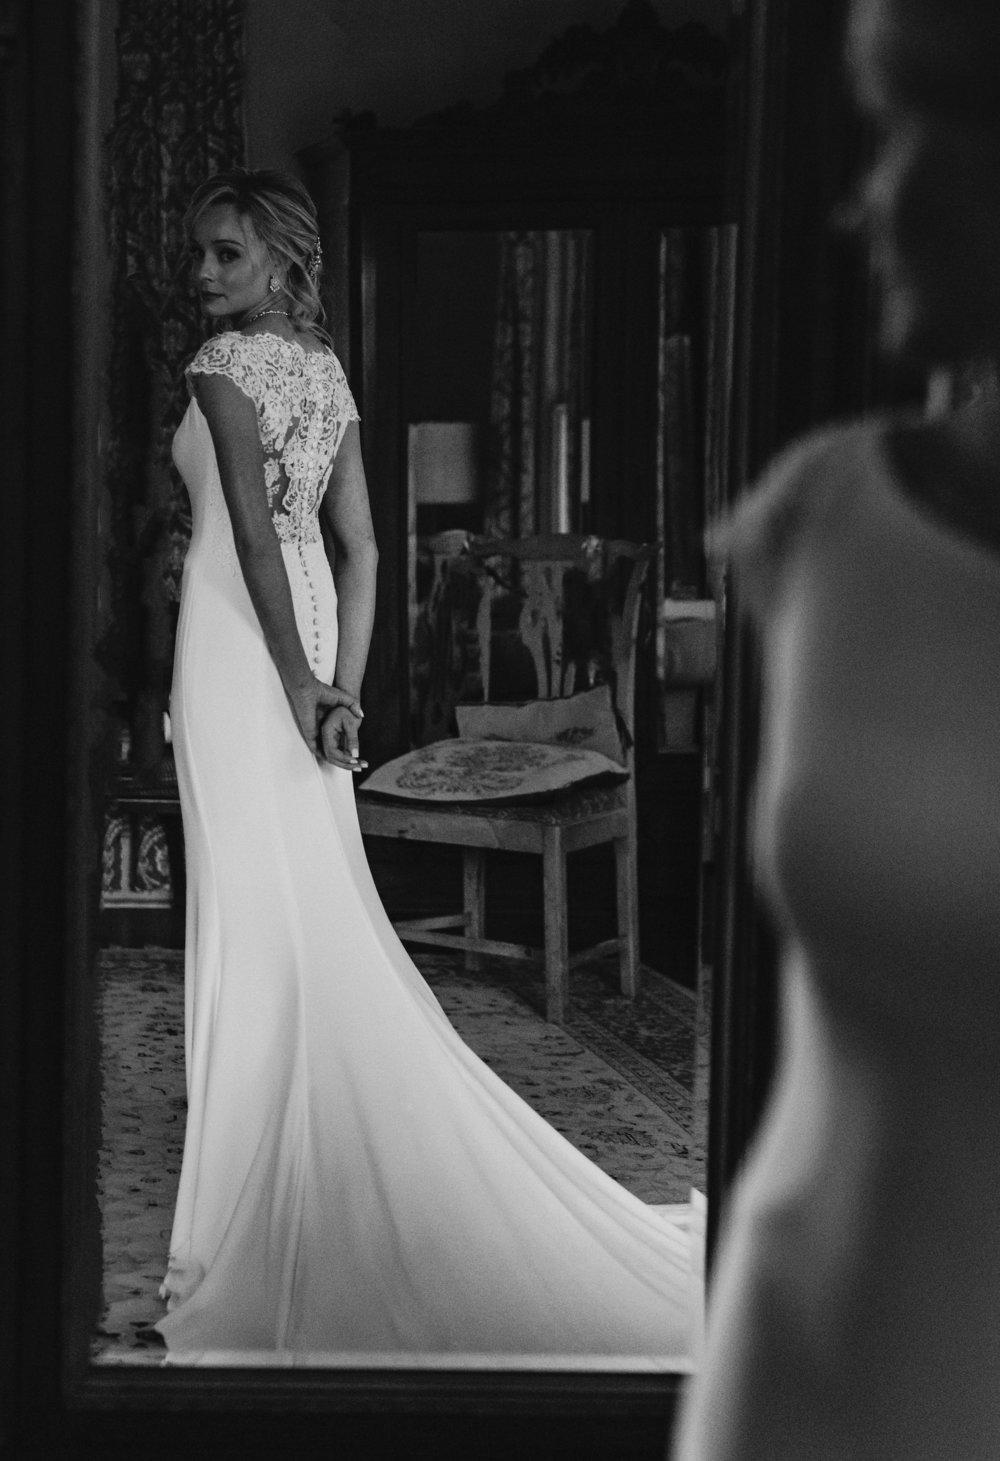 barr-mansion-wedding-mihka-joseph31243.JPG